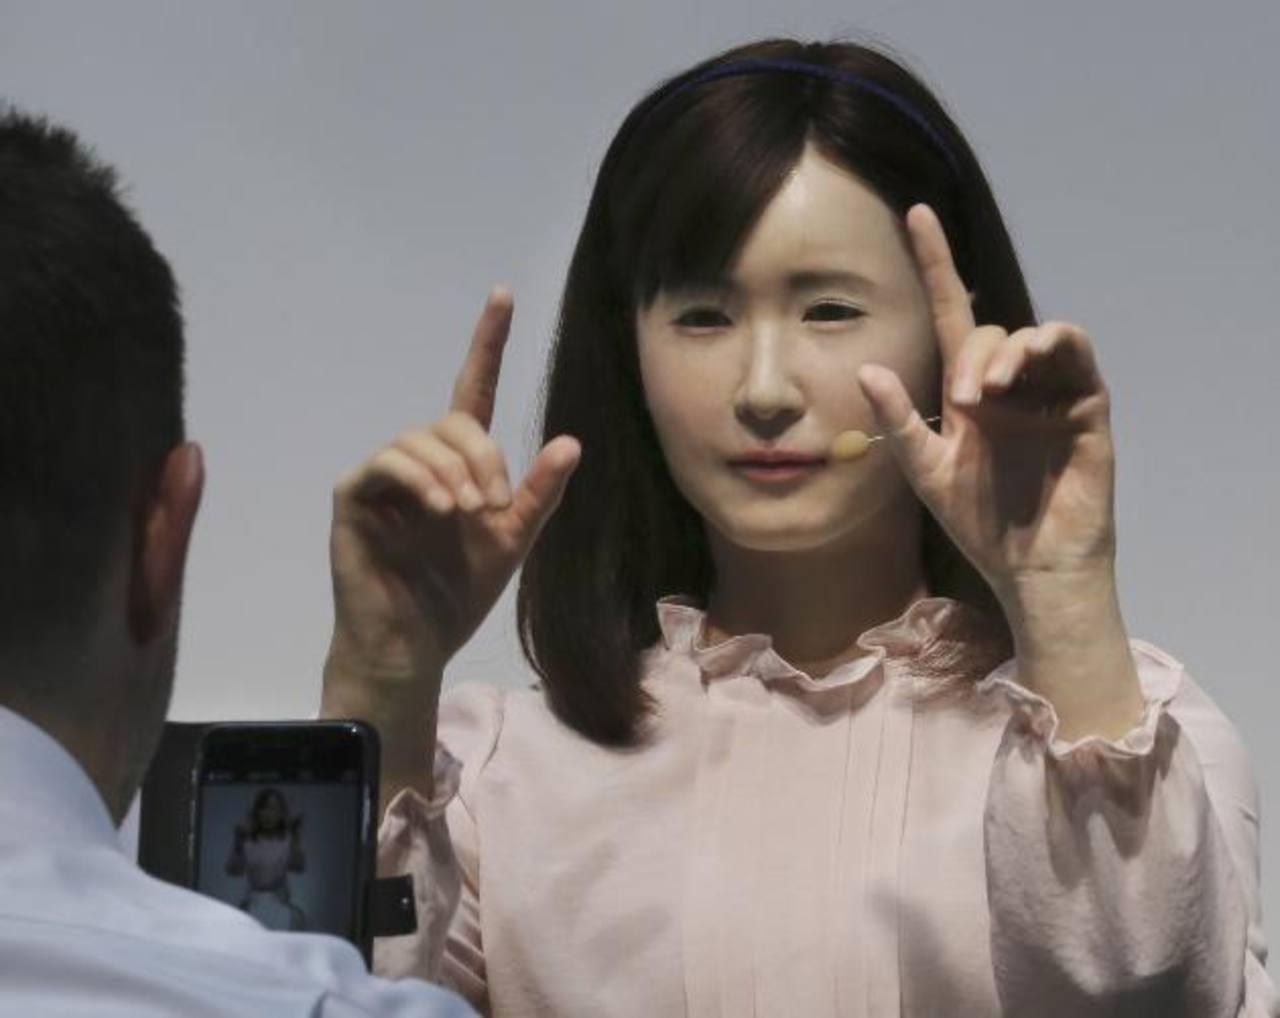 Androide de Aiko Chihira permite la comunicación por señas.